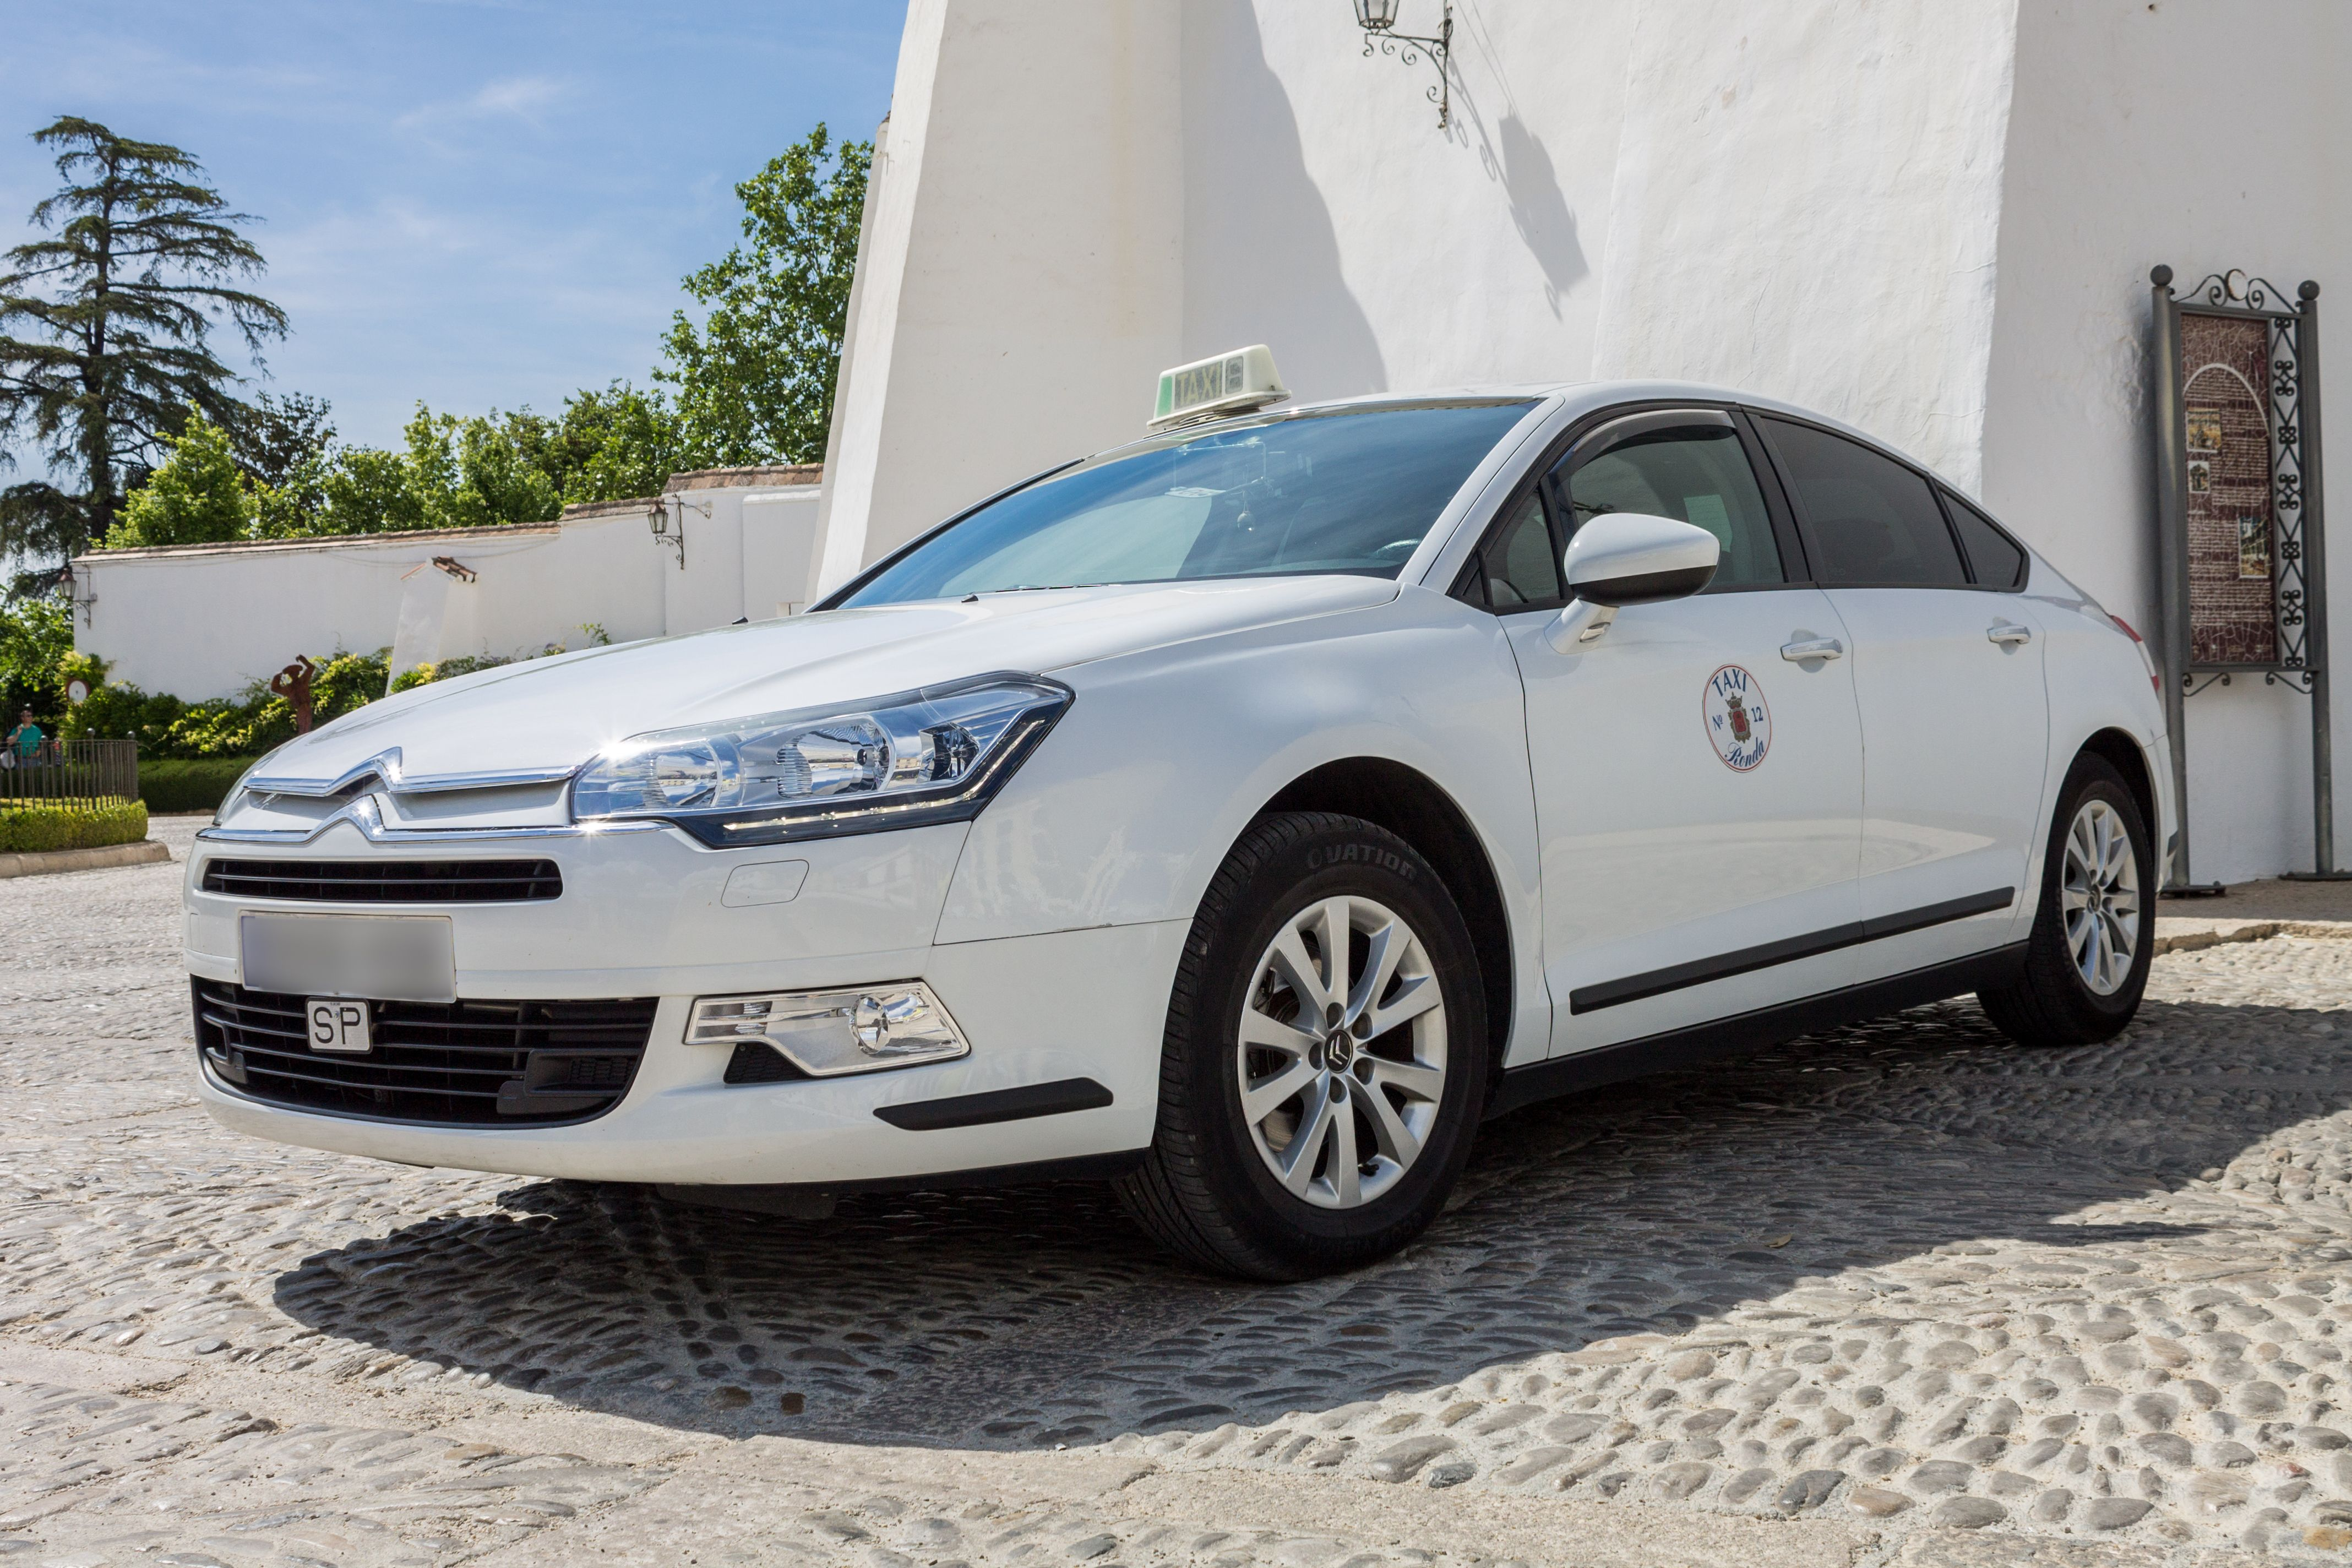 Taxi largo recorrido en Ronda